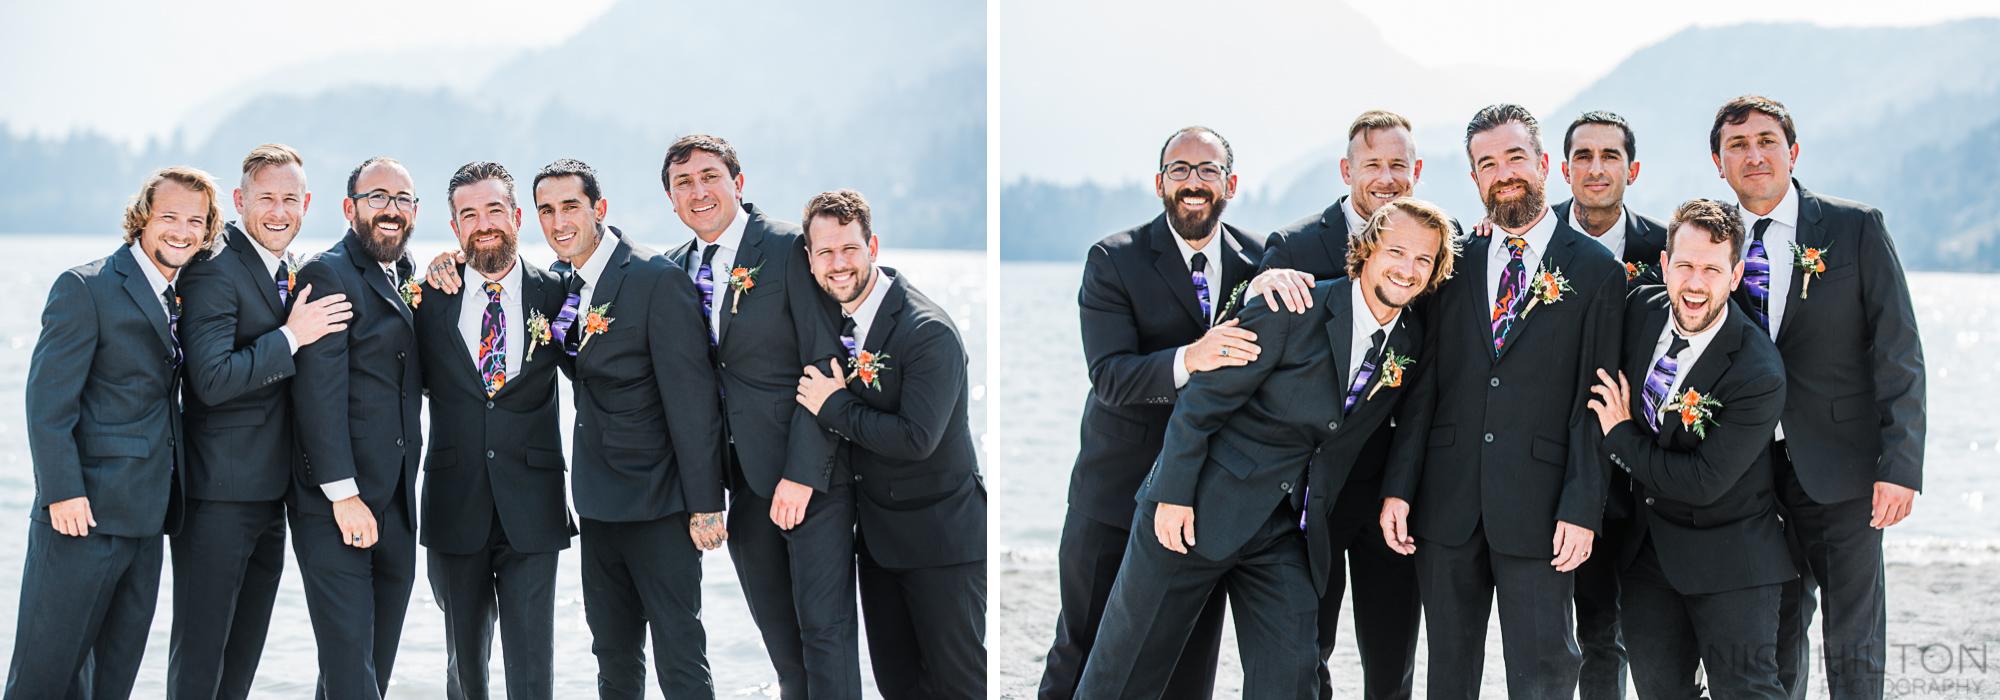 June-Lake-beach-wedding-groomsmen.jpg